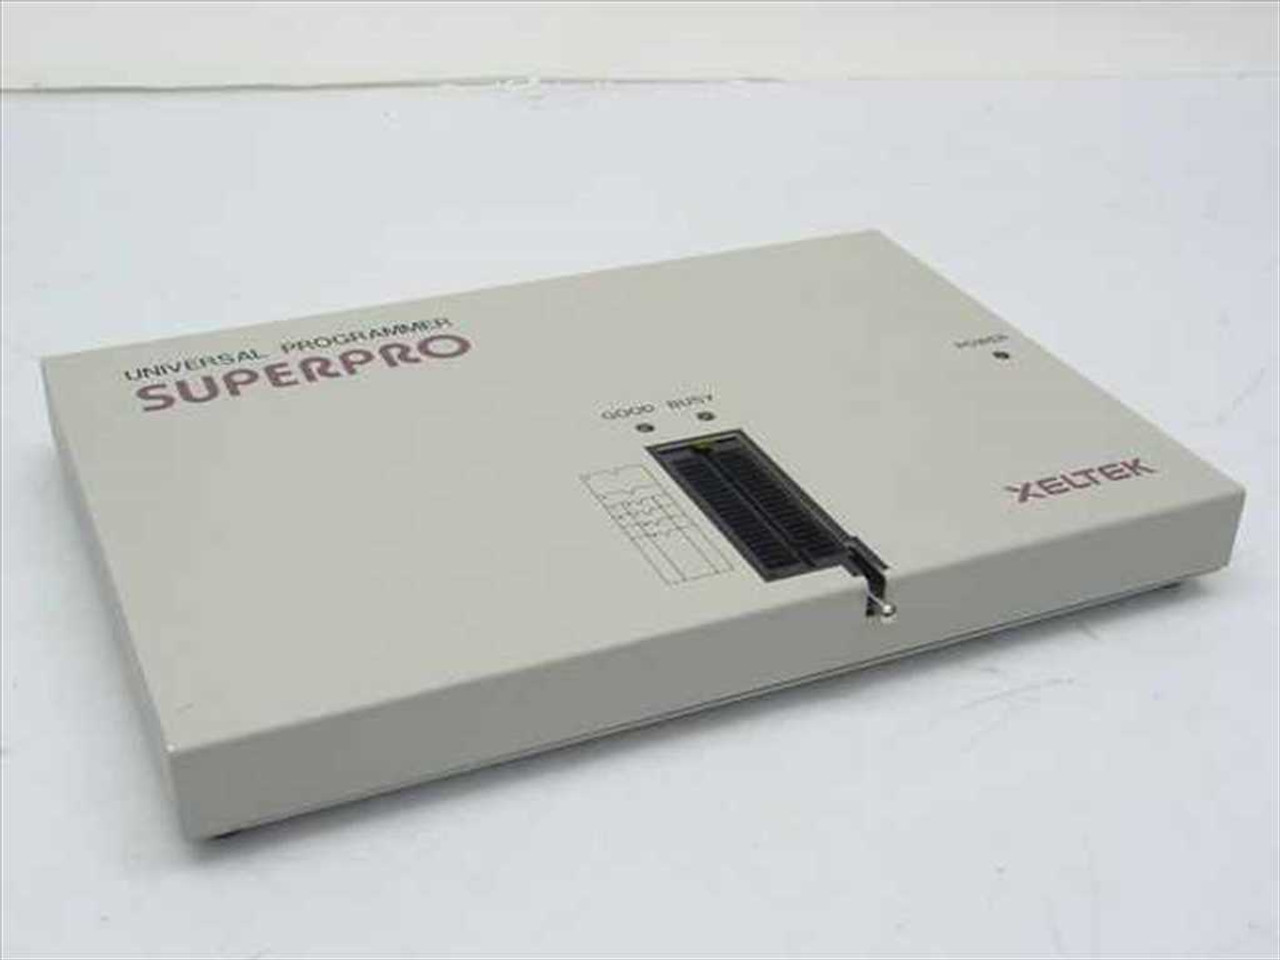 Xeltek Superpro Universal Programmer - no cable or AC Adapter